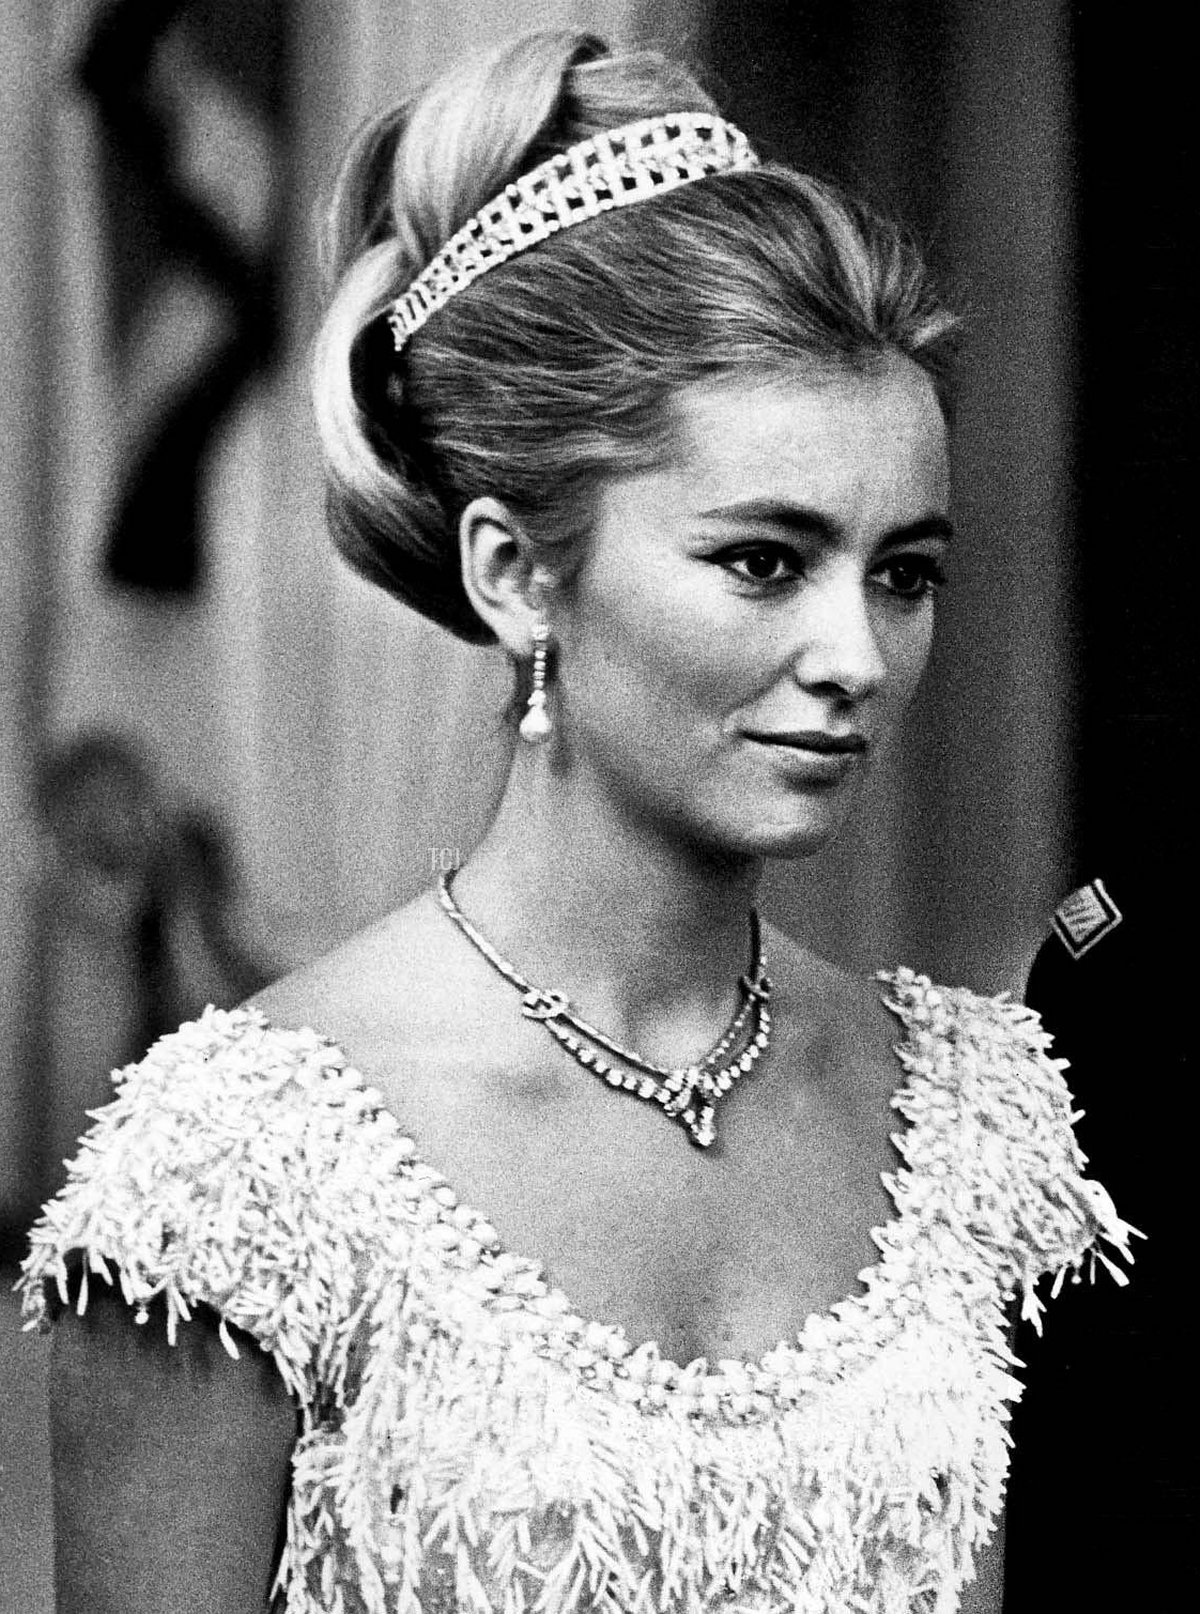 Prince Albert and Princess Paola of Belgium, August 1968